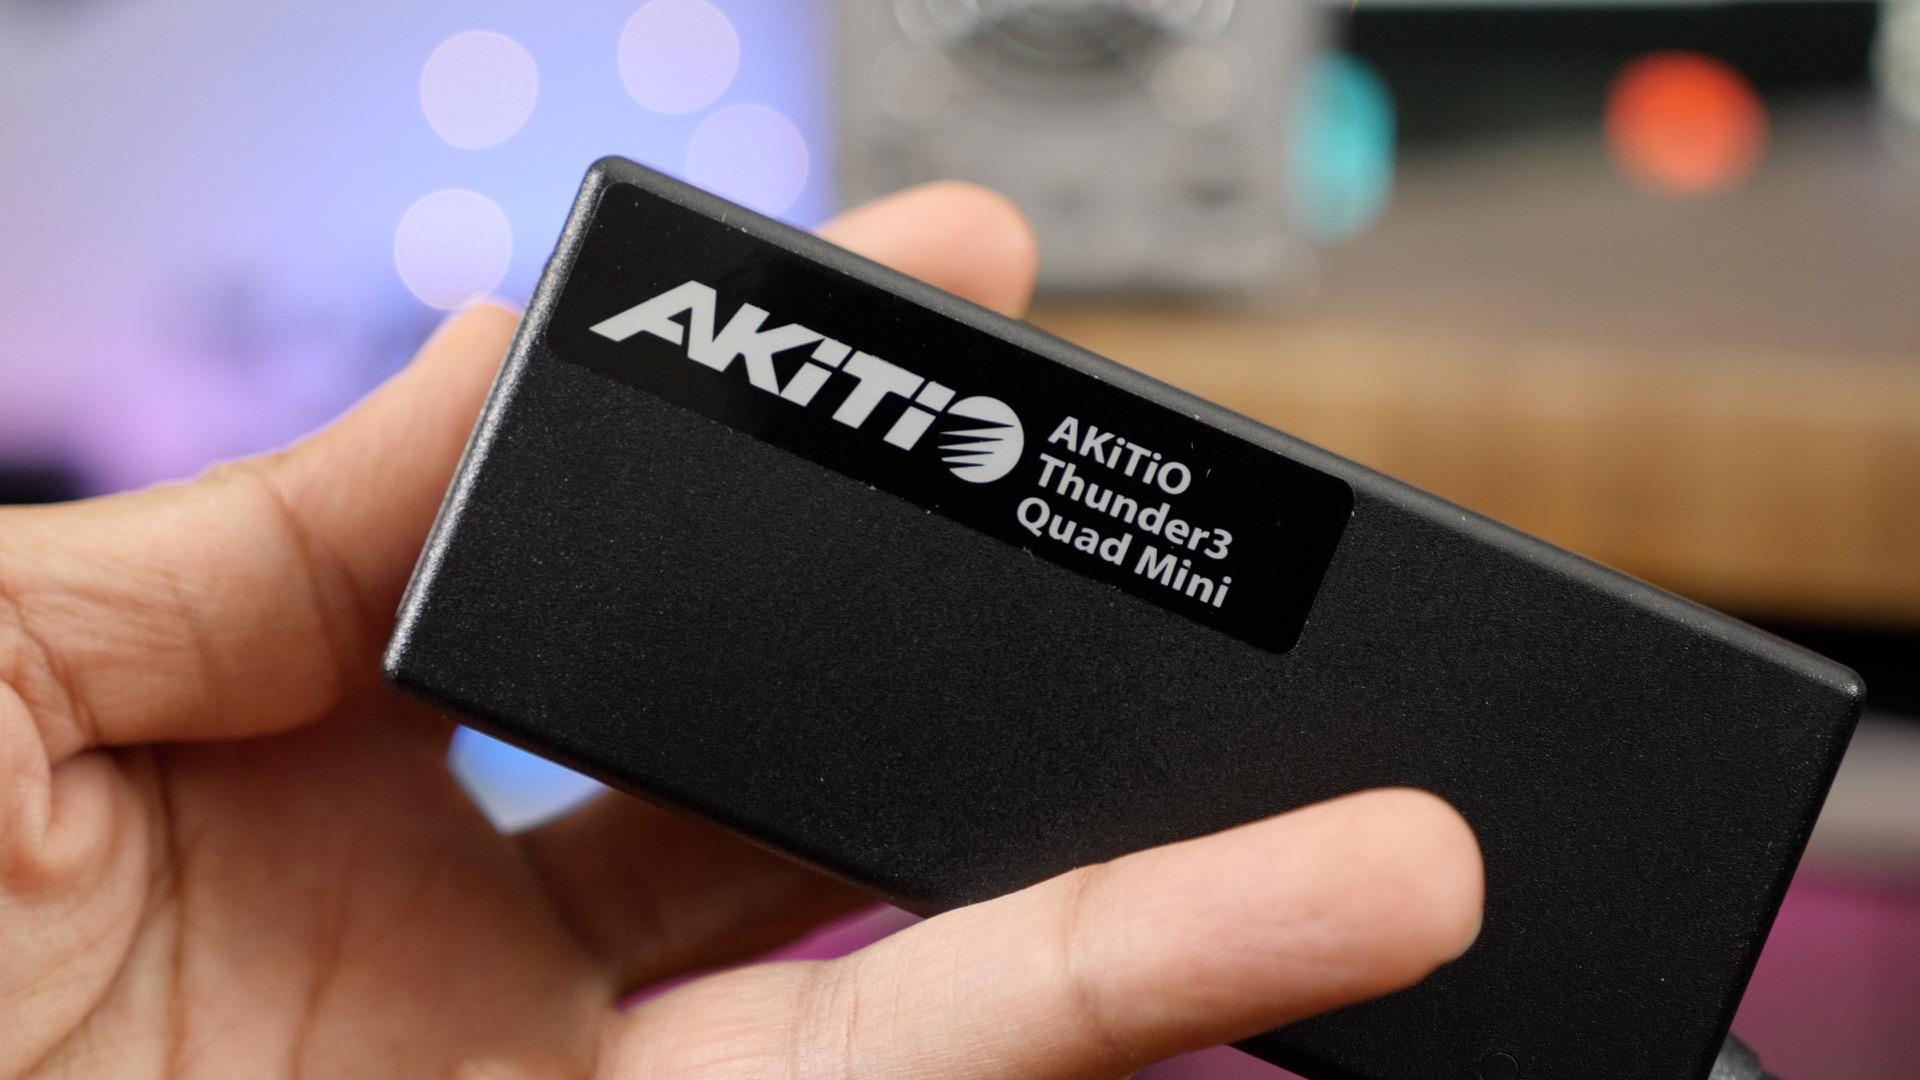 Akitio Thunder3 Quad Mini Power Adapter